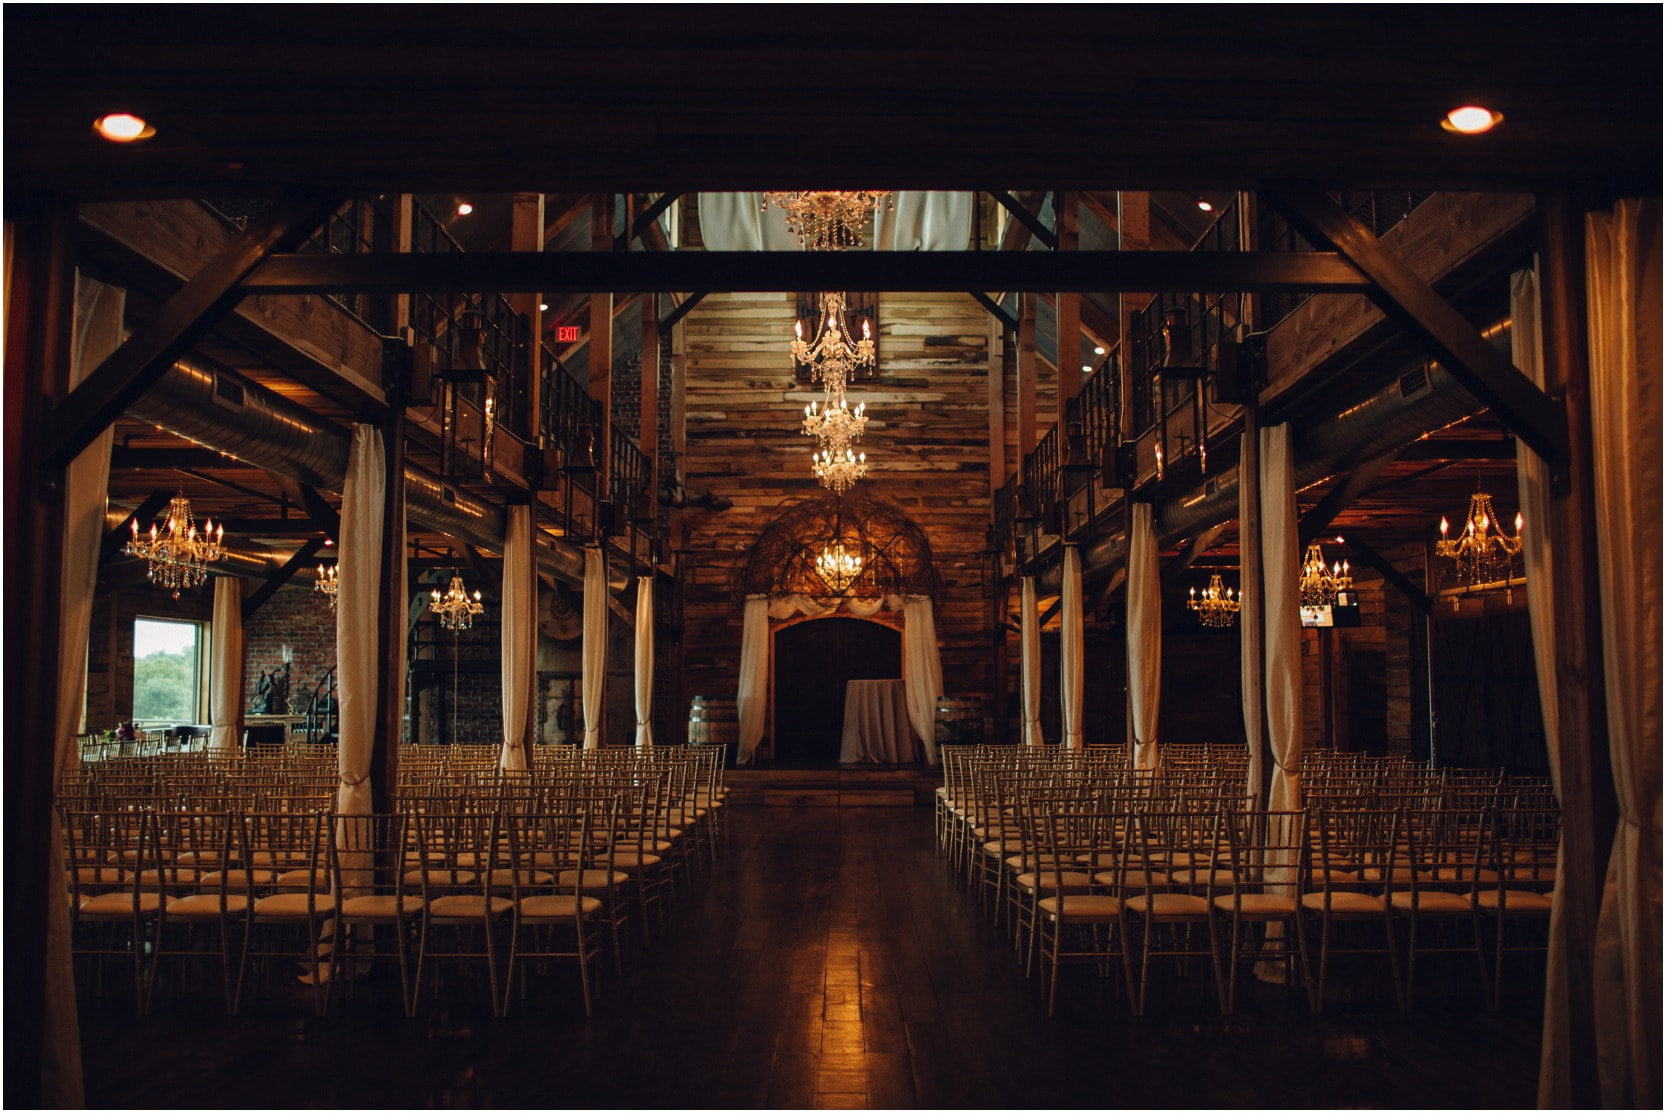 coderhillenburg_oklahoma_wedding__4_blogstomped